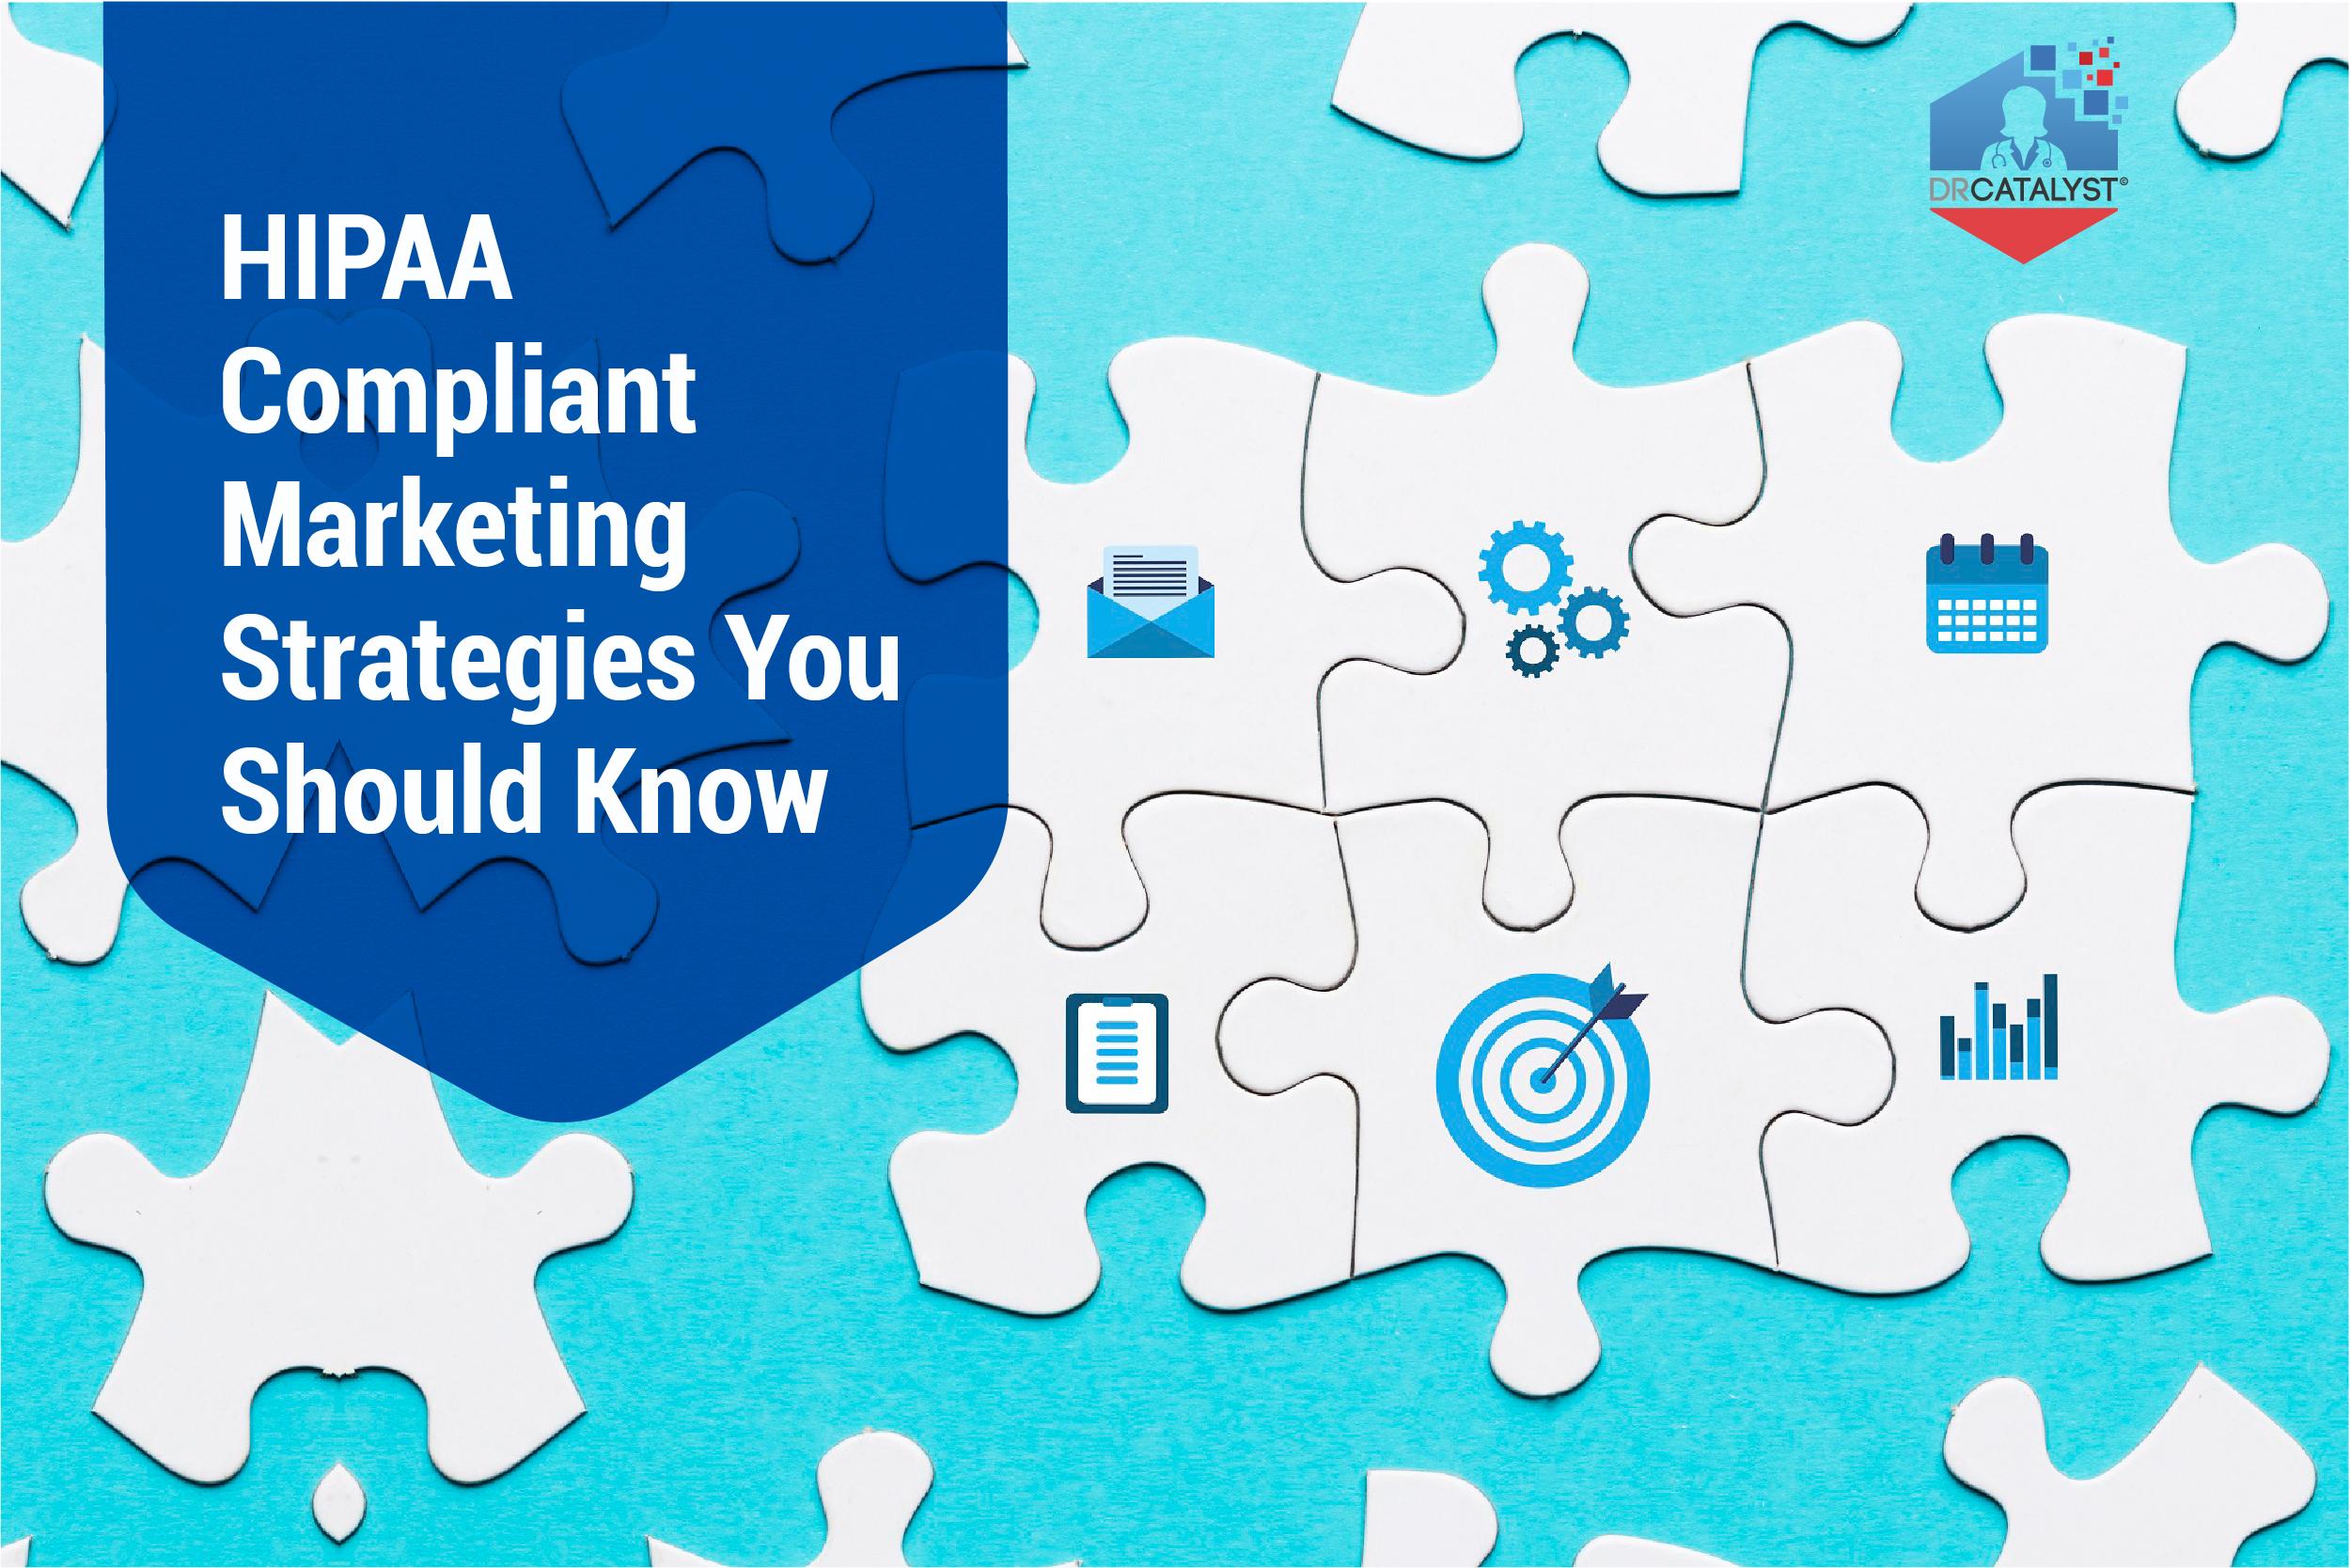 HIPAA Compliant Marketing Strategies